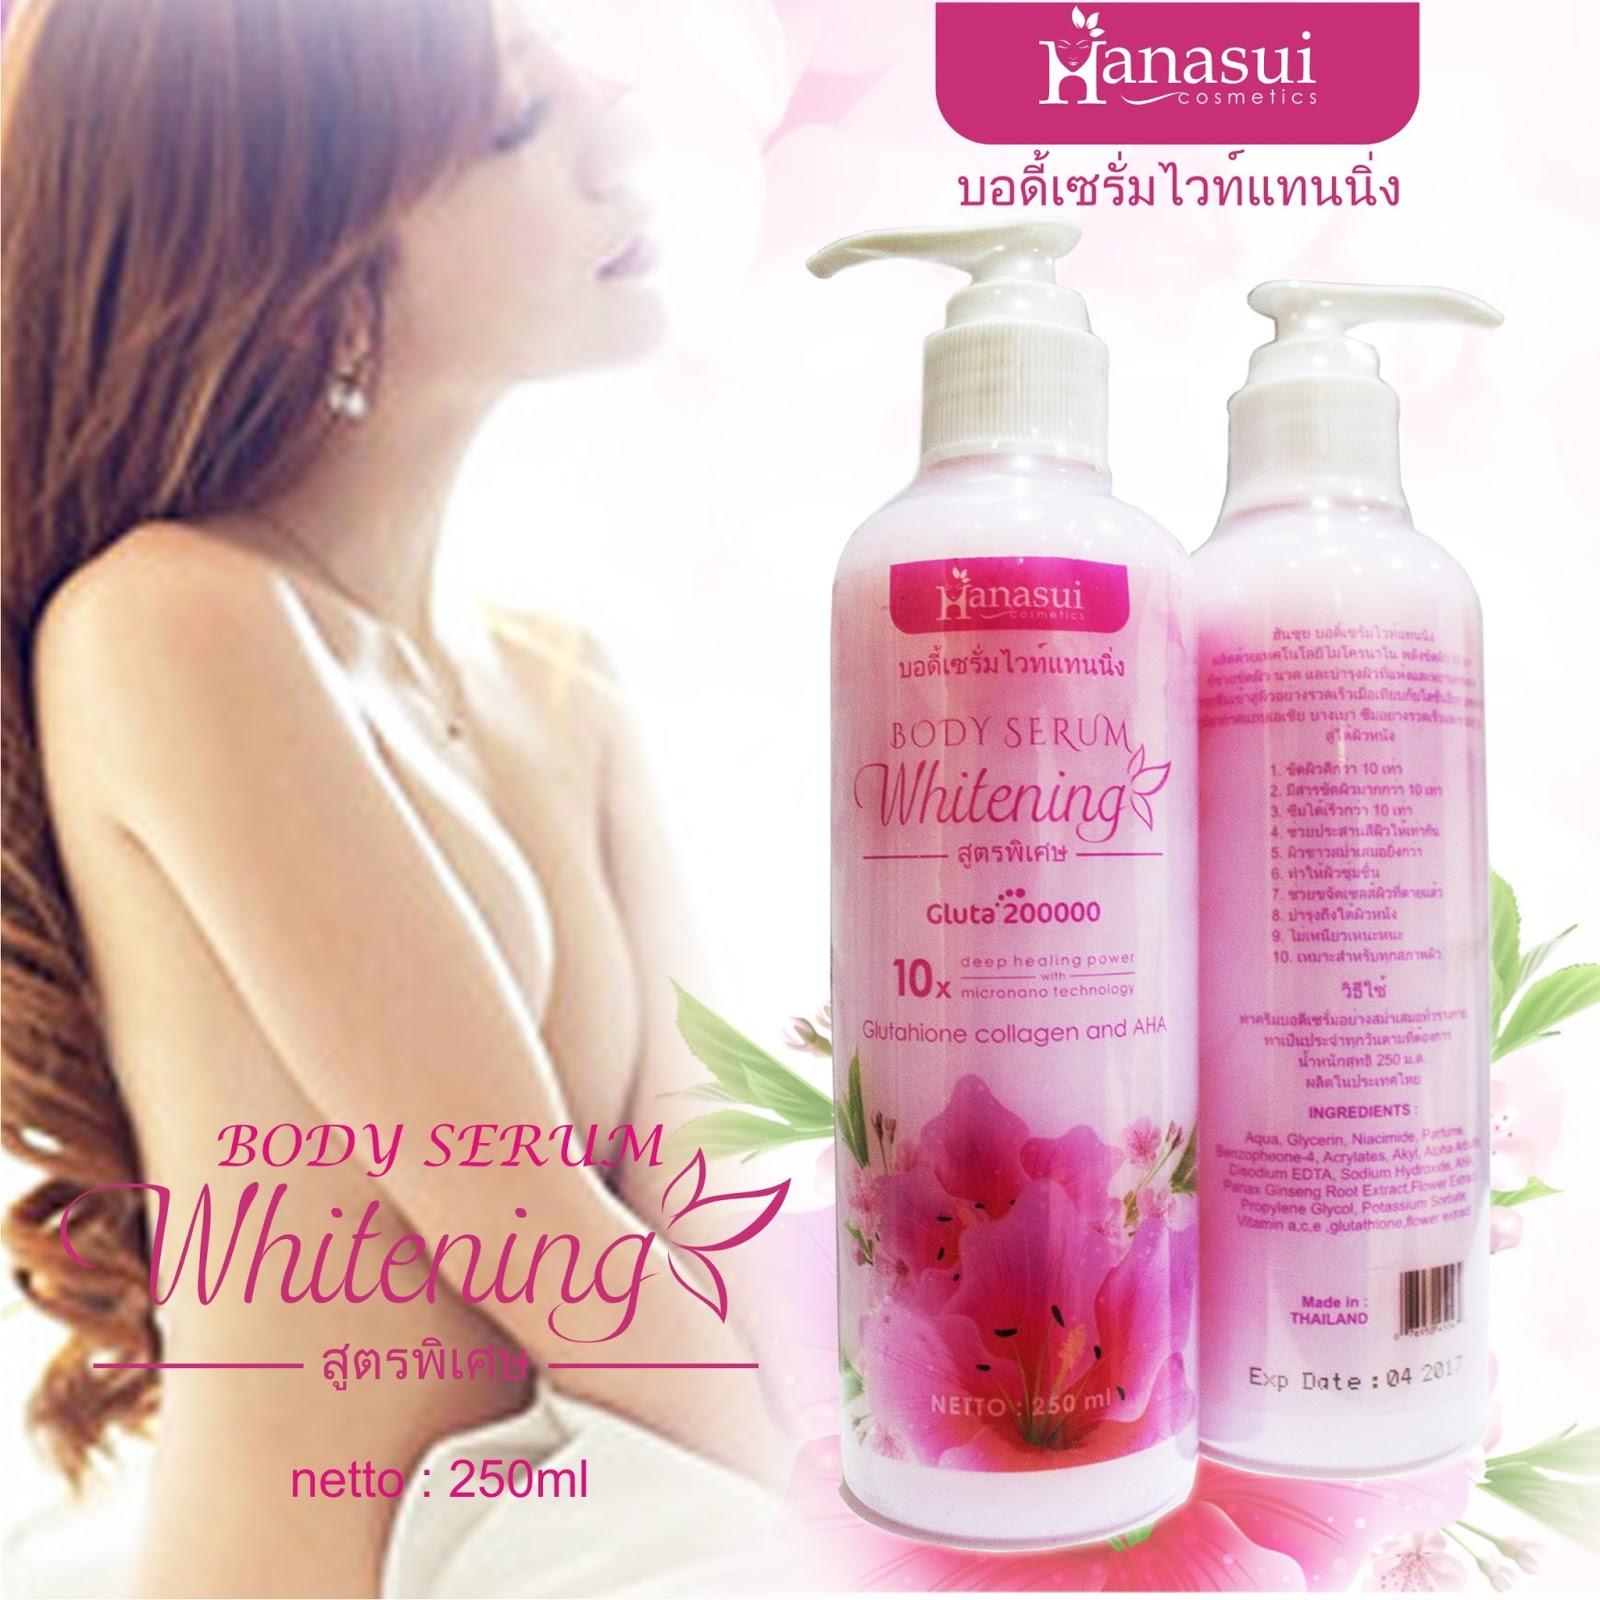 Katalog Belanja Online Hanasui Body Whitening Serum Gold Bpom Original